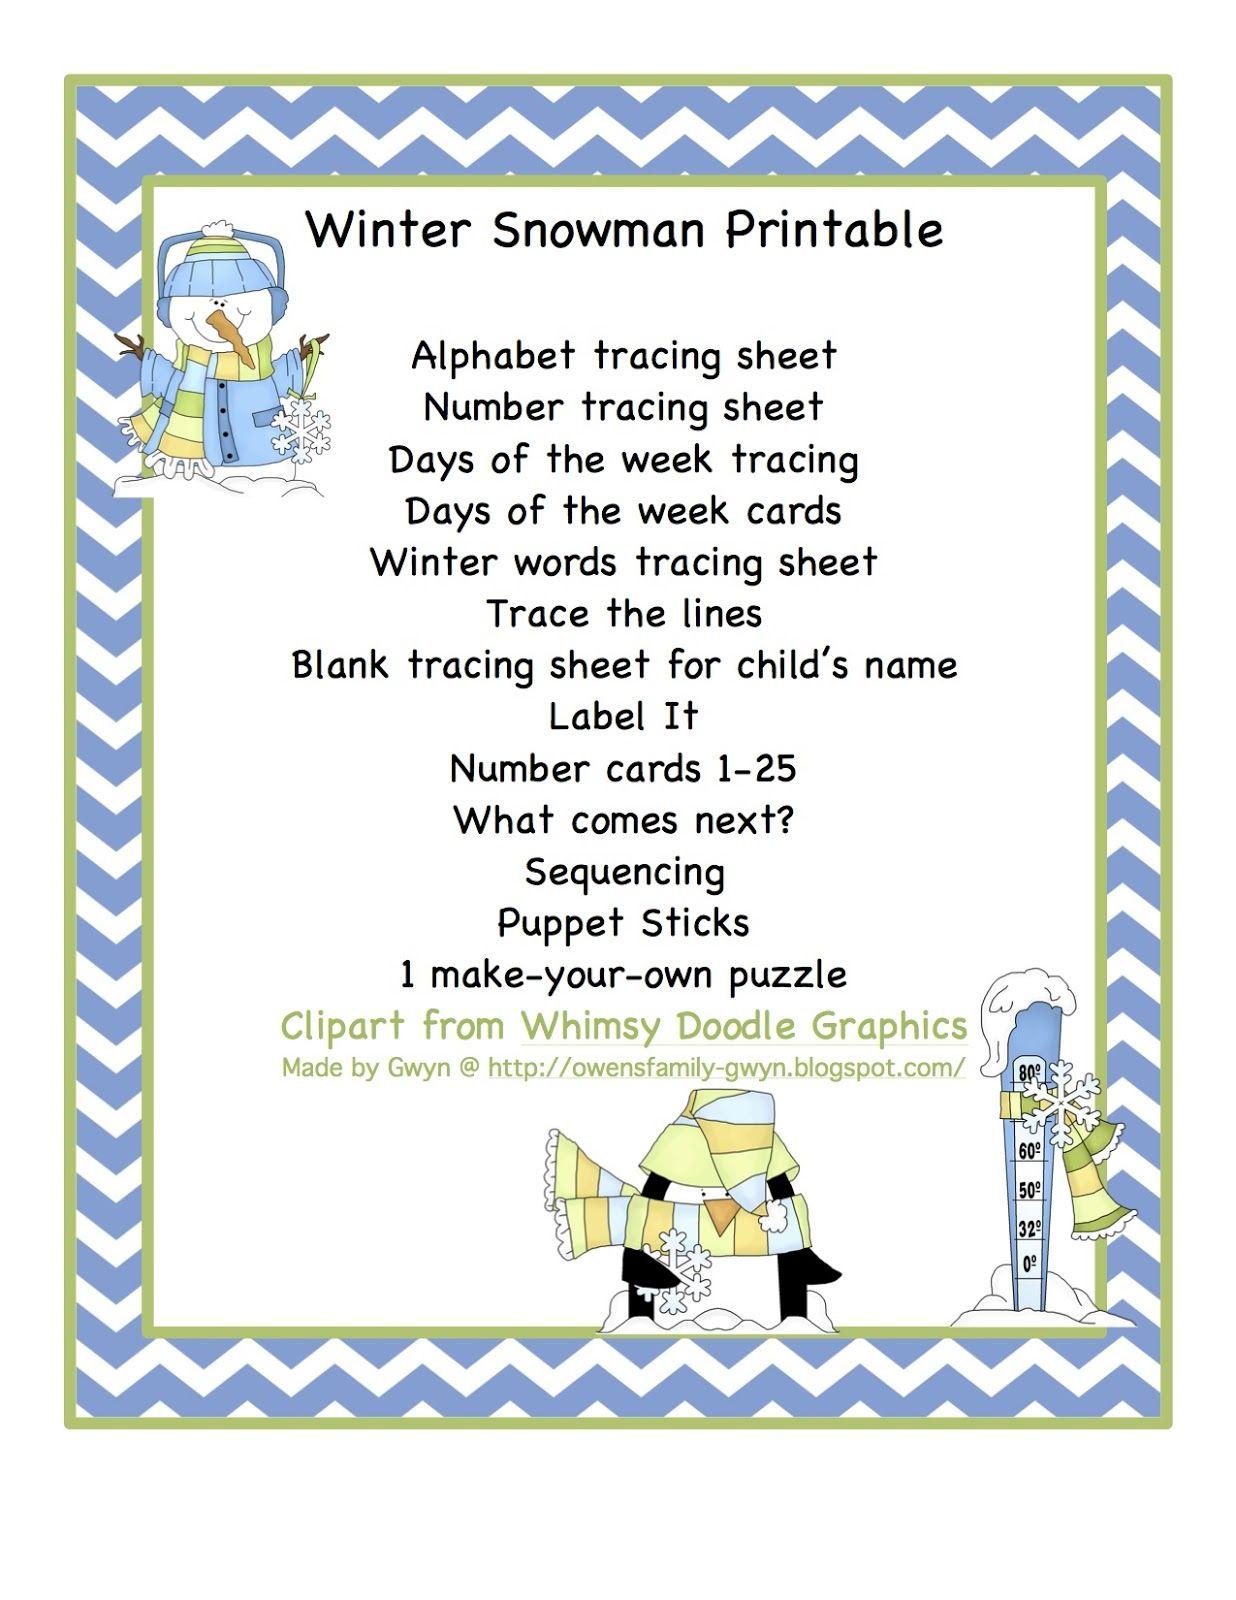 Winter Snowman Printable